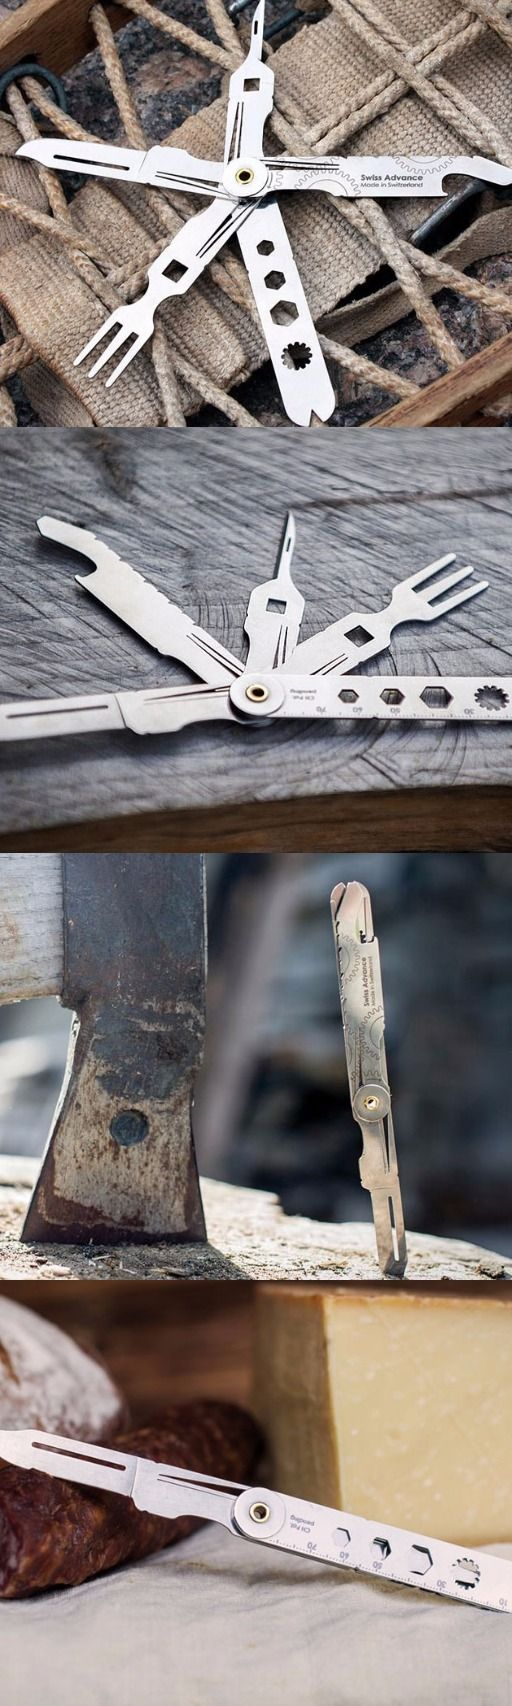 Swiss Advance SSA30353 EDC Everyday Carry Pocket Knife Tool @aegisgears